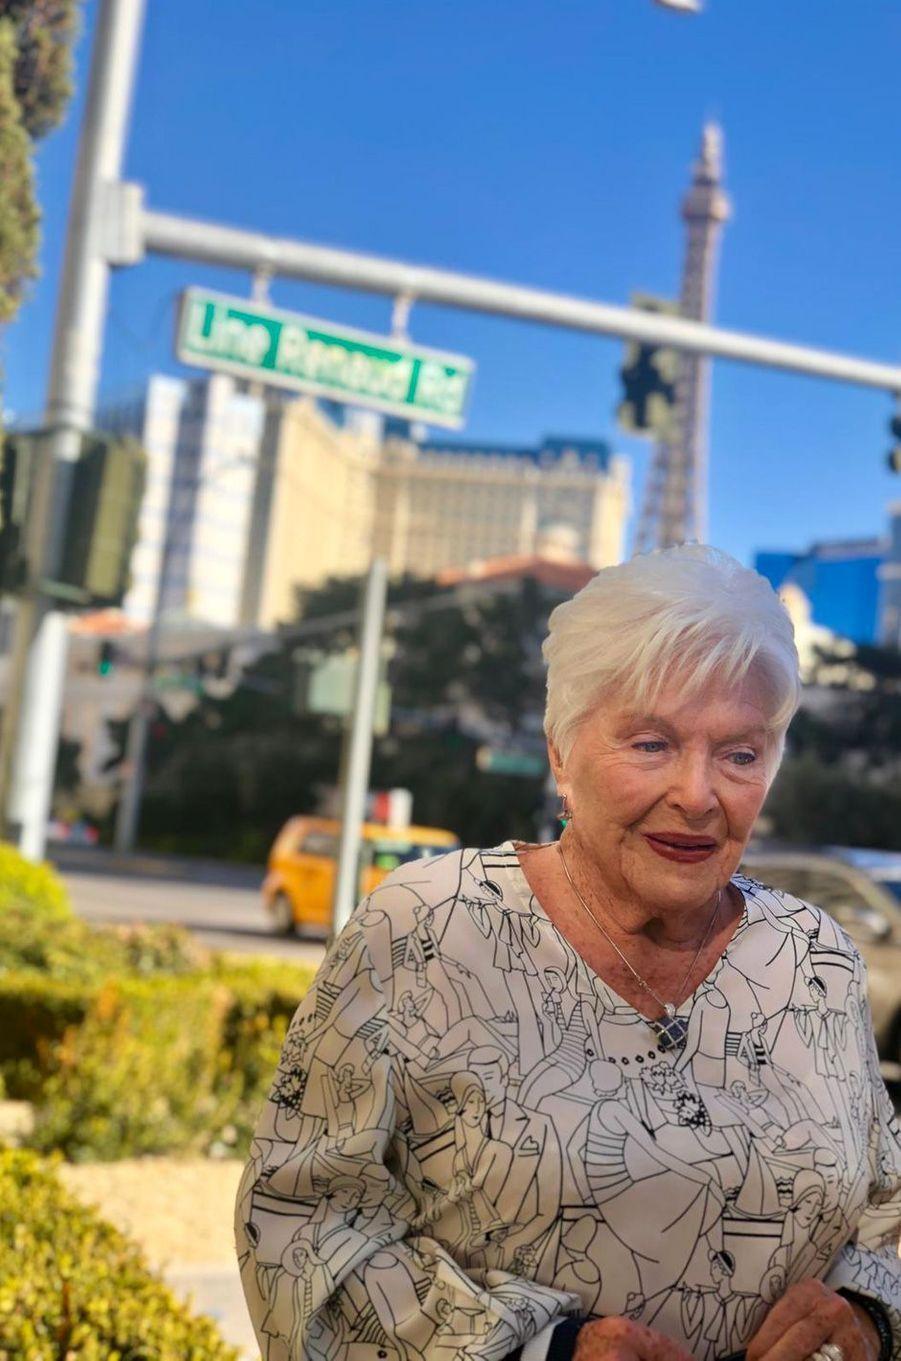 Line Renaud devant la rue qui porte son nom à Las Vegas.